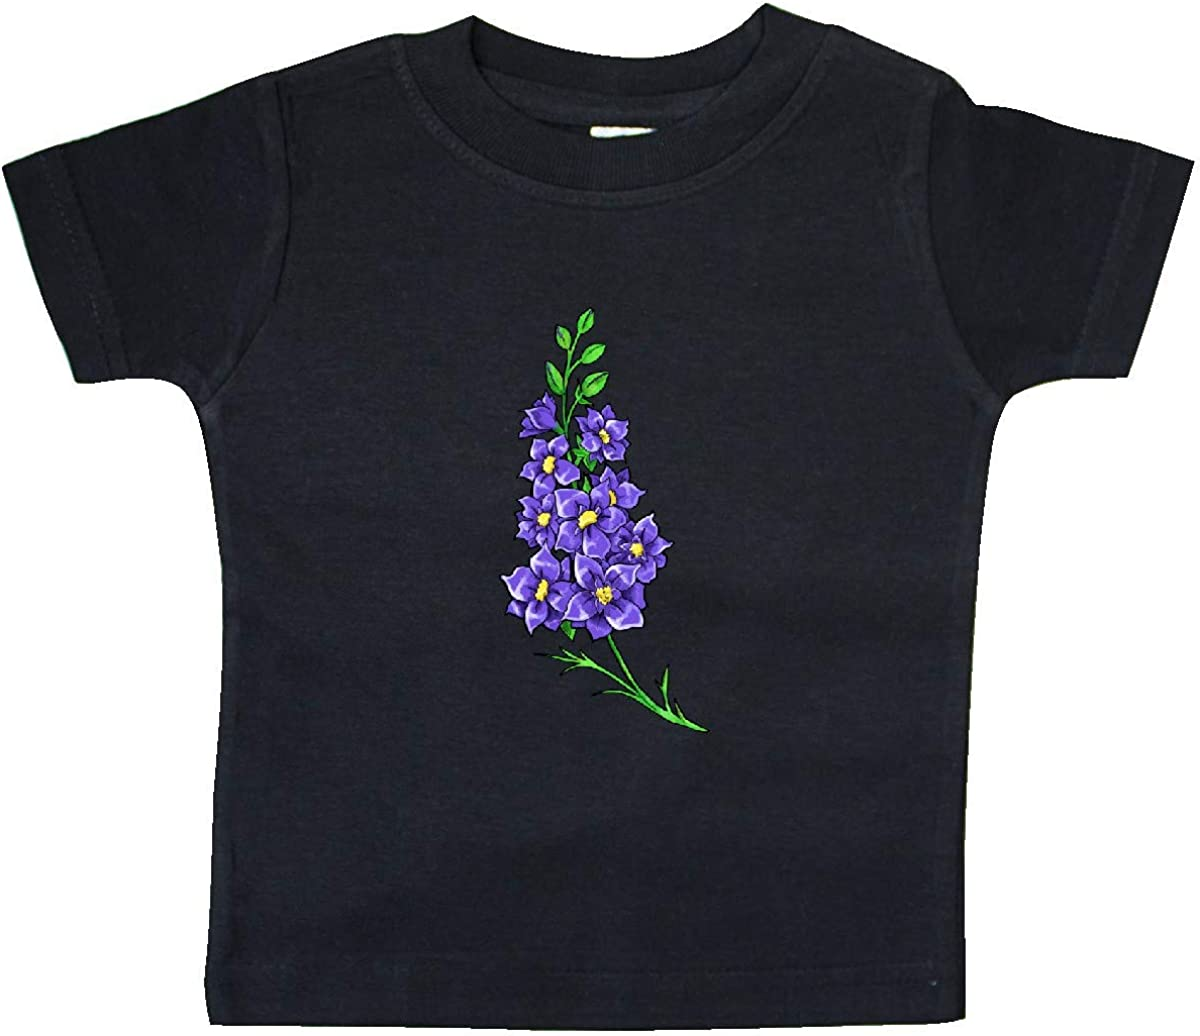 inktastic Larkspur Delphinium Wildflowers Baby T-Shirt